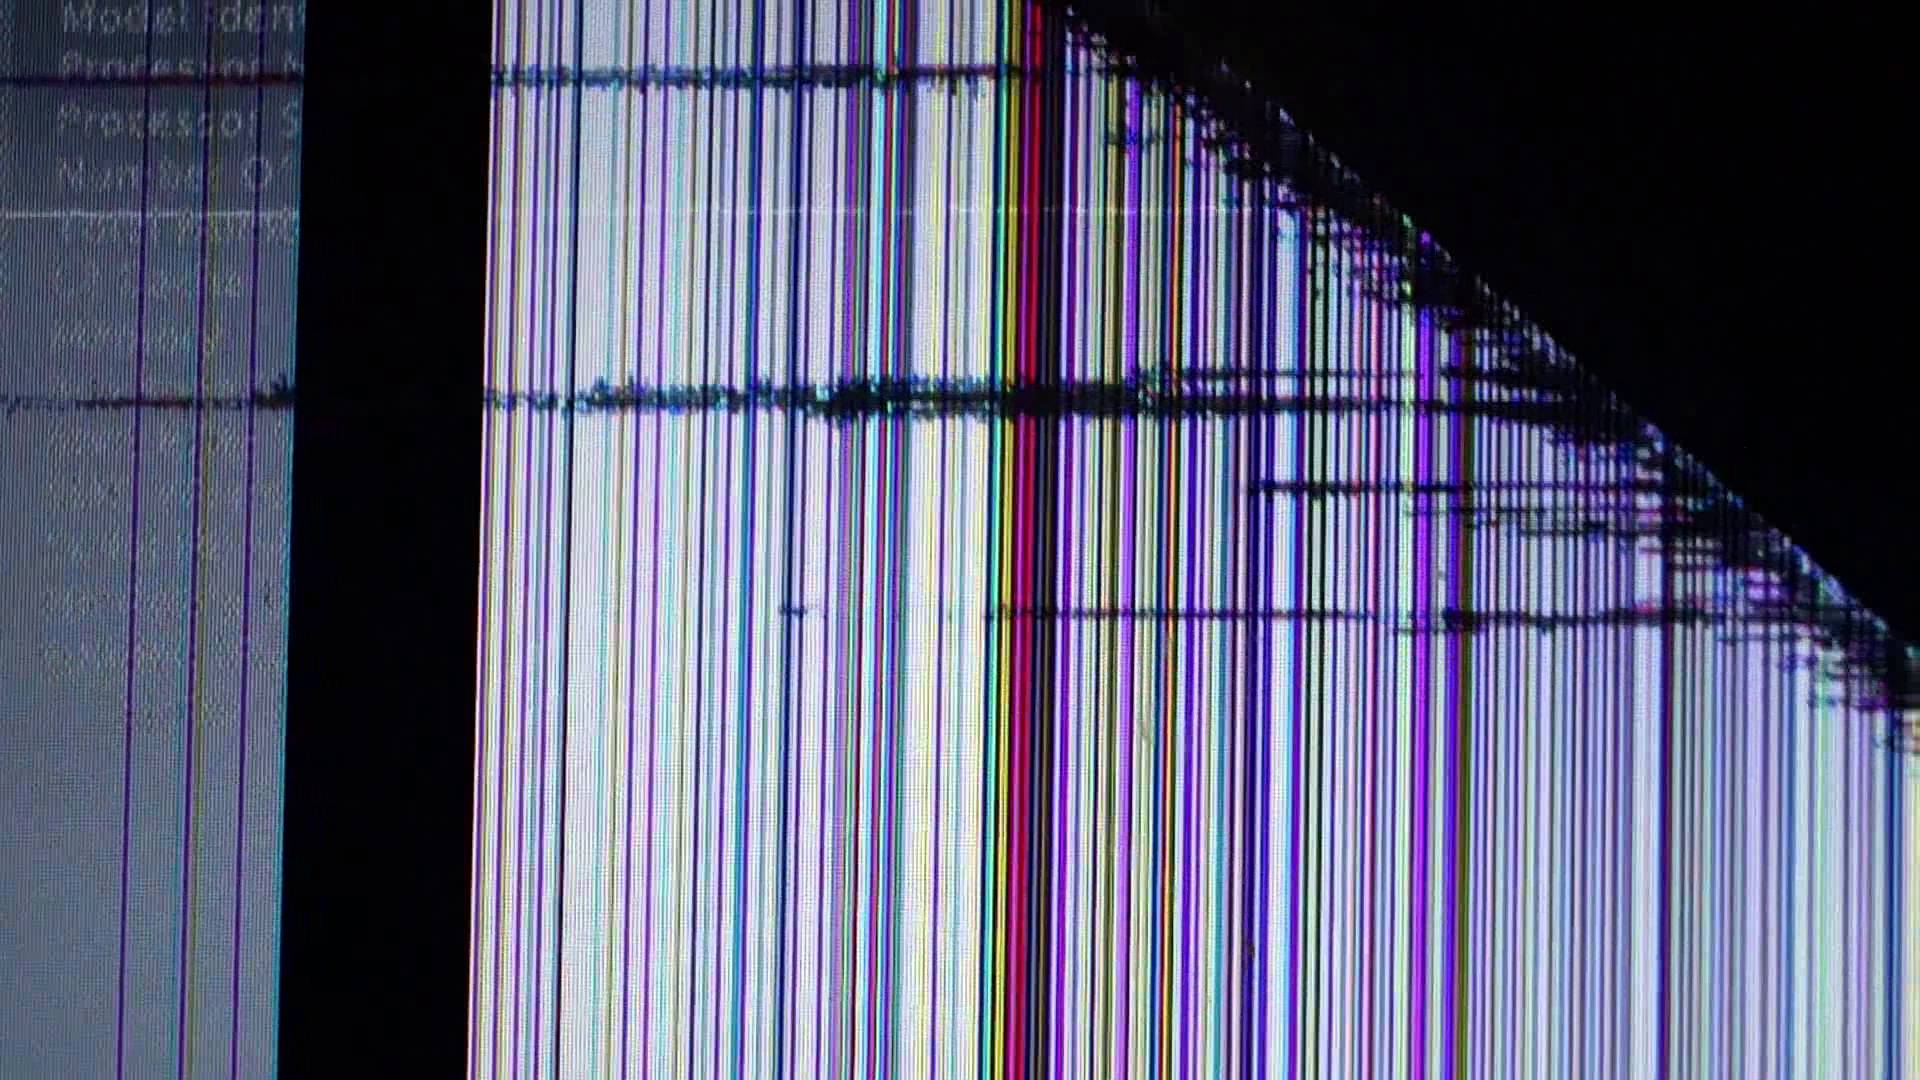 cracked tv screen prank wallpaper 62 images - HD1920×1080